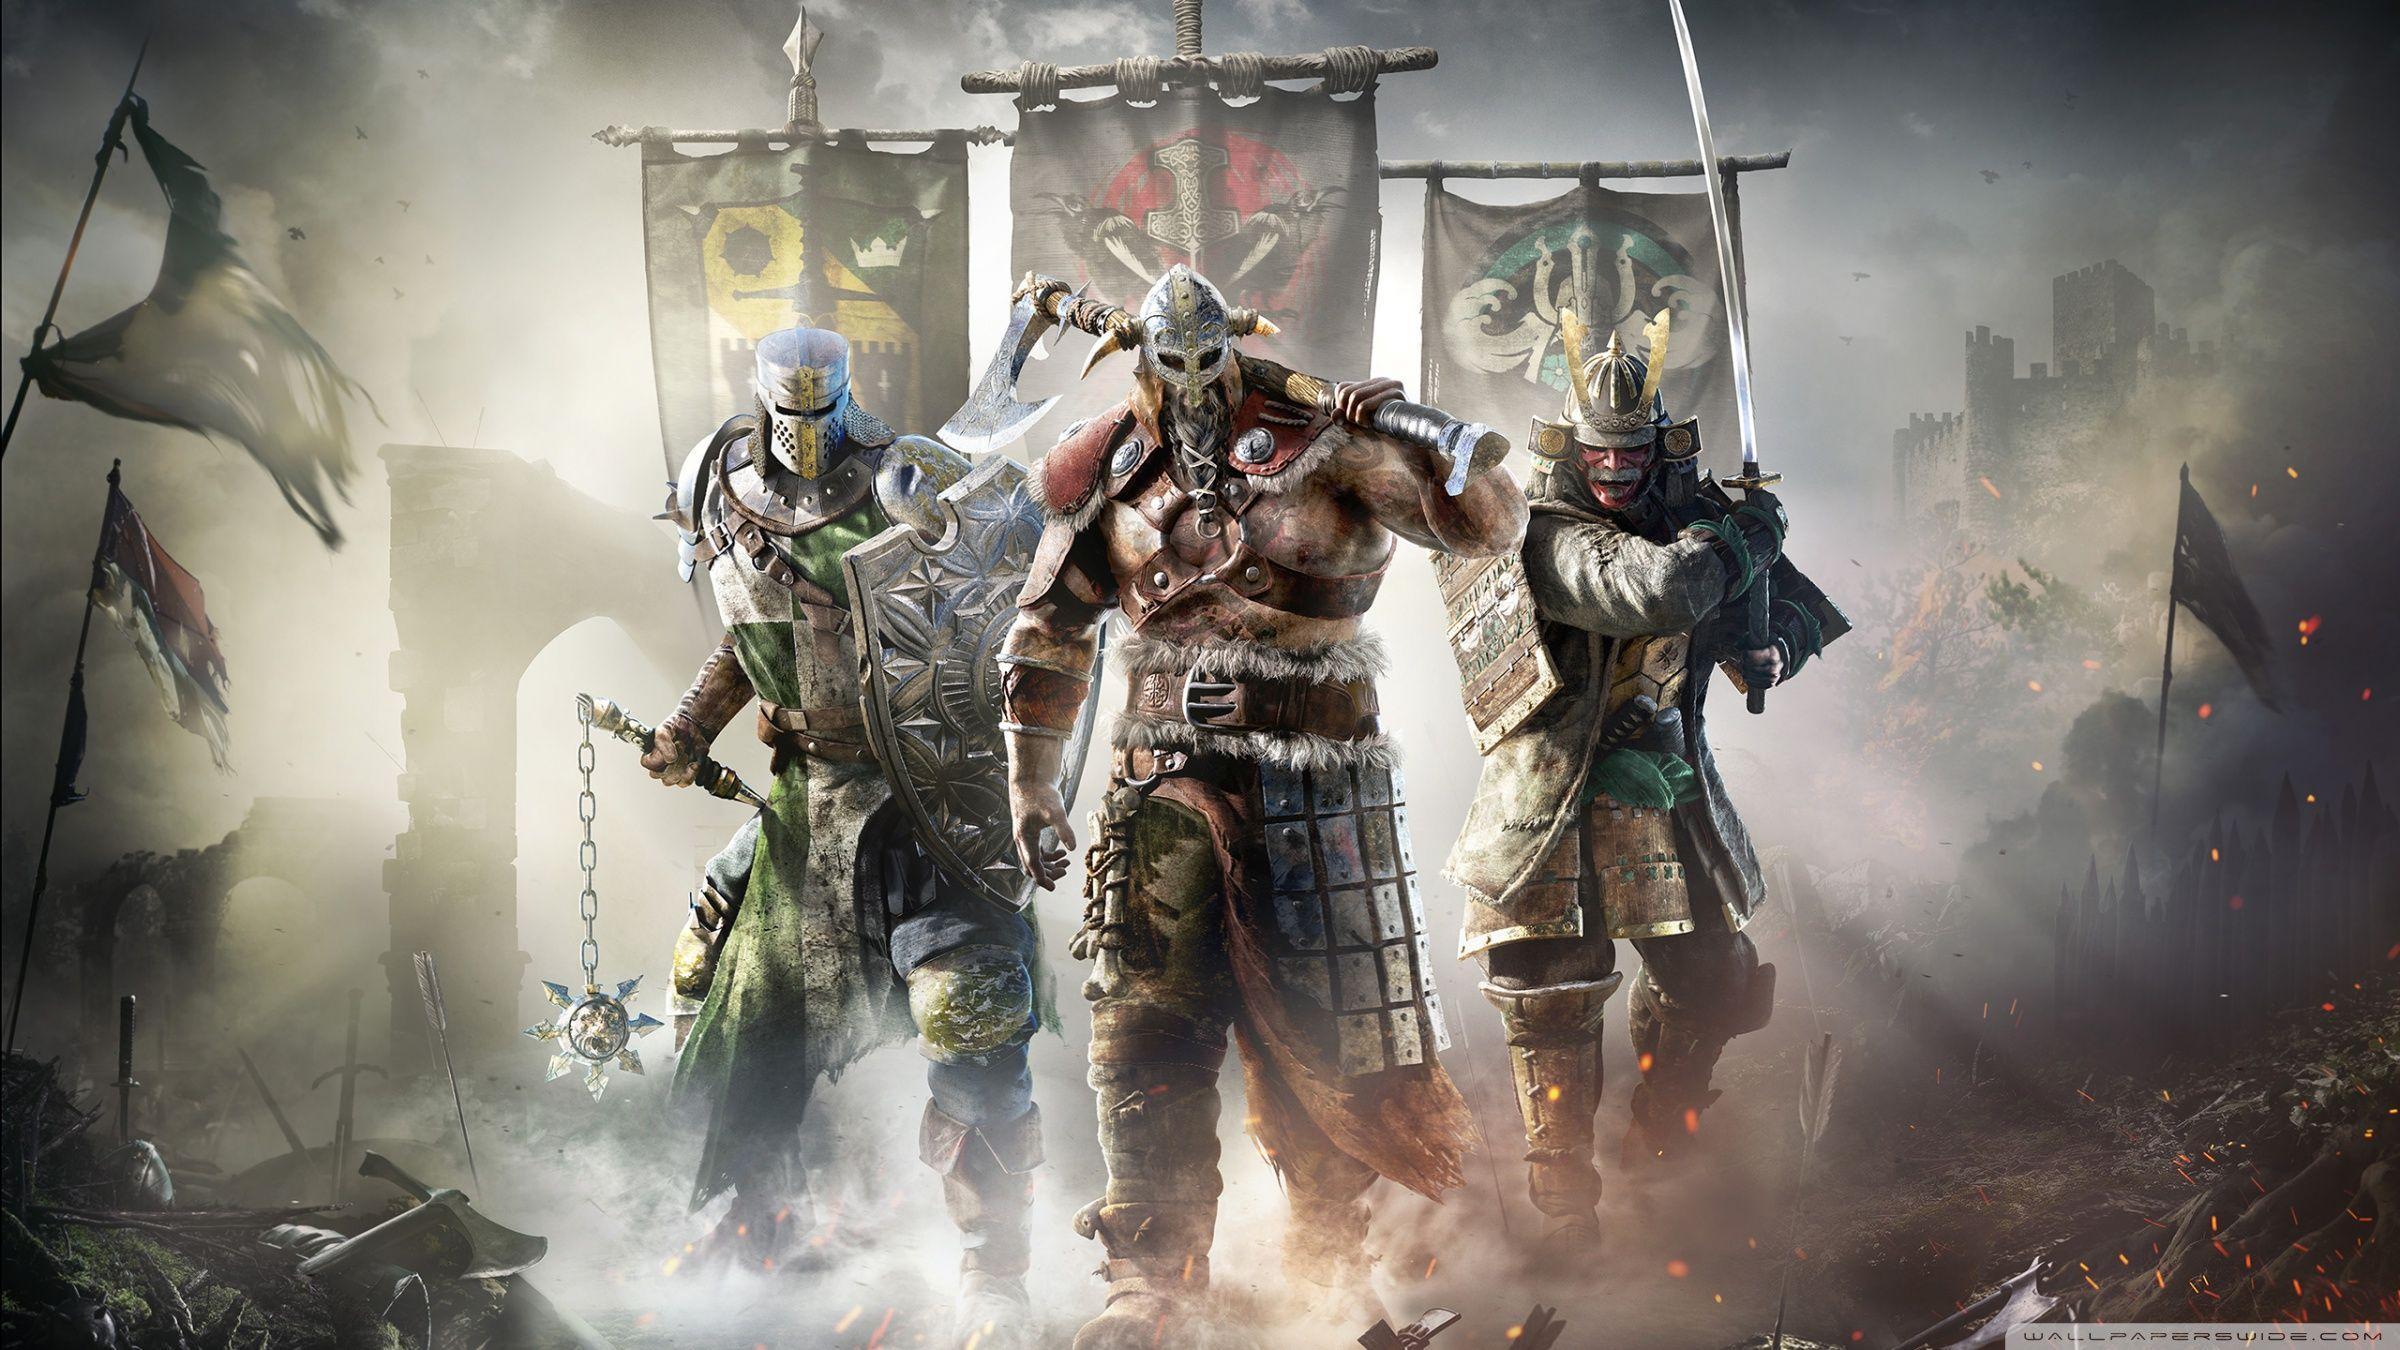 Warriors Wallpapers Hd Wallpaper Cave